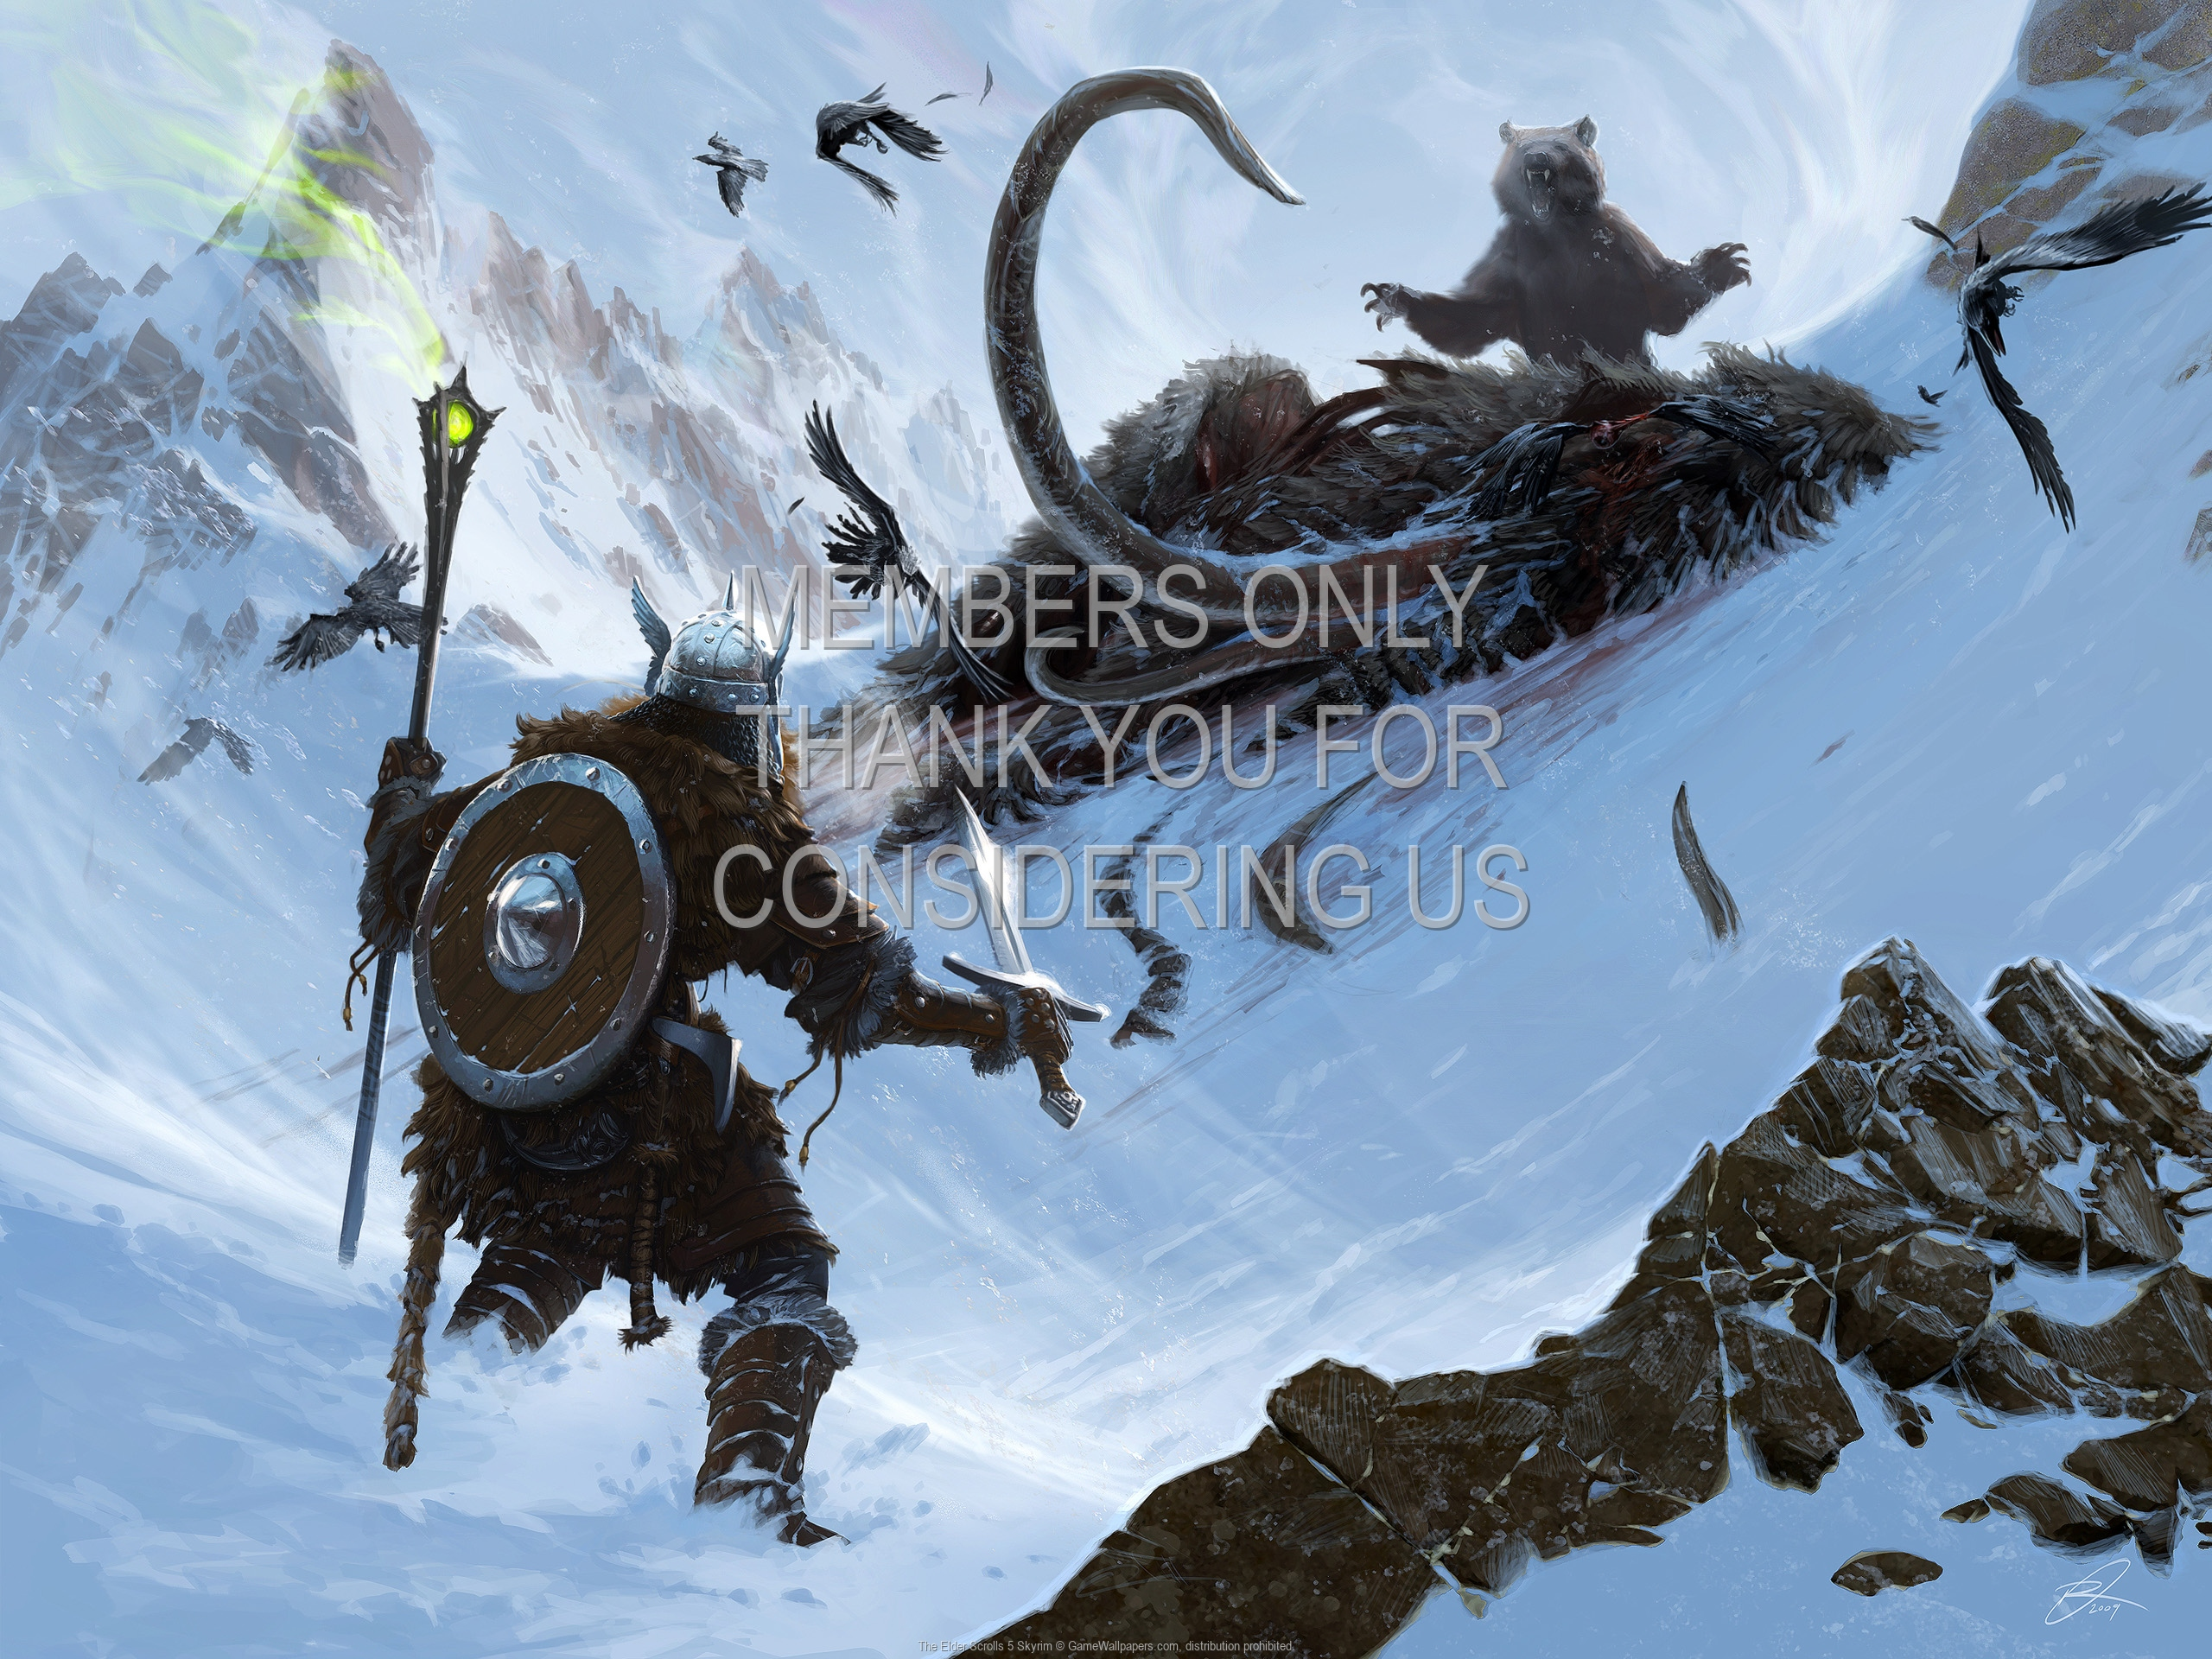 The Elder Scrolls 5: Skyrim 1920x1080 Handy Hintergrundbild 02